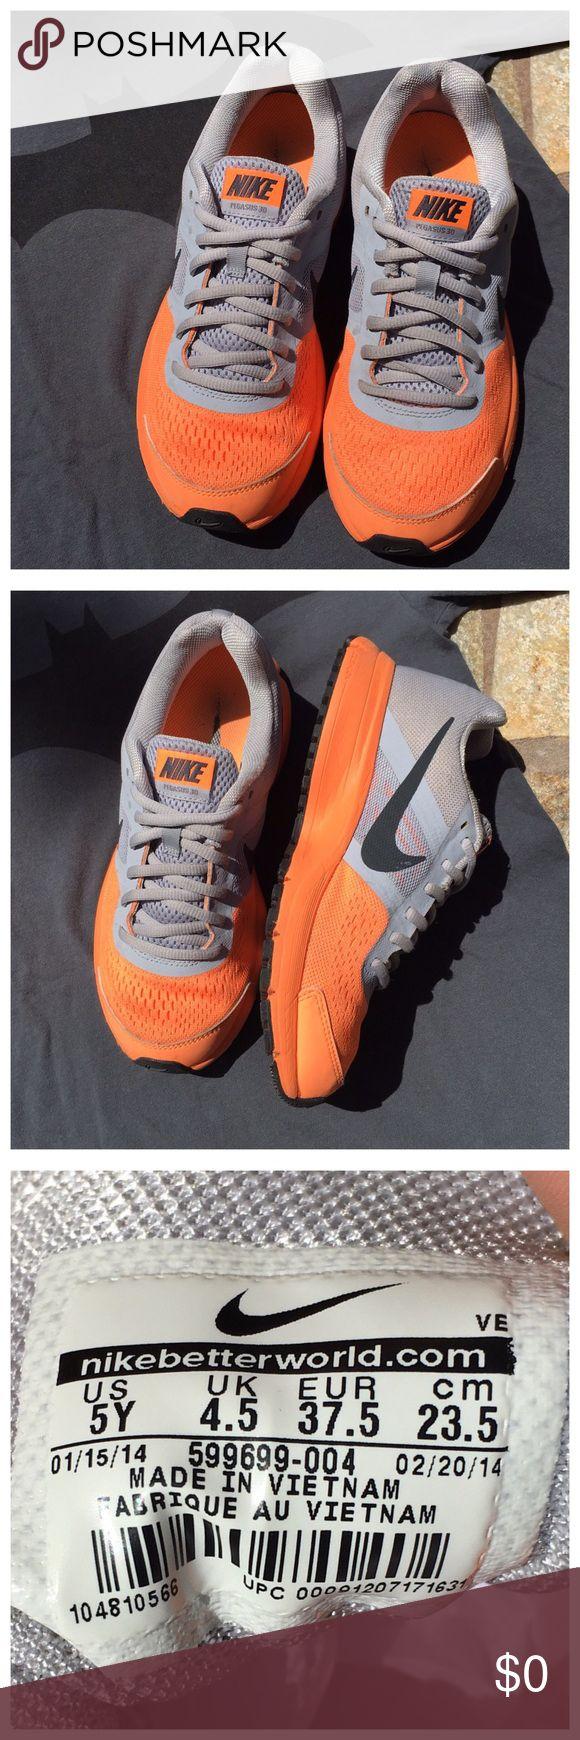 NIKE PEGASUS 30 GREY & ORANGE SNEAKERS NIKE PEGASUS 30 GREY & ORANGE SNEAKERS. Color: Grey, Orange. Size: US 5 Y. Condition: See pics. Nike Shoes Sneakers